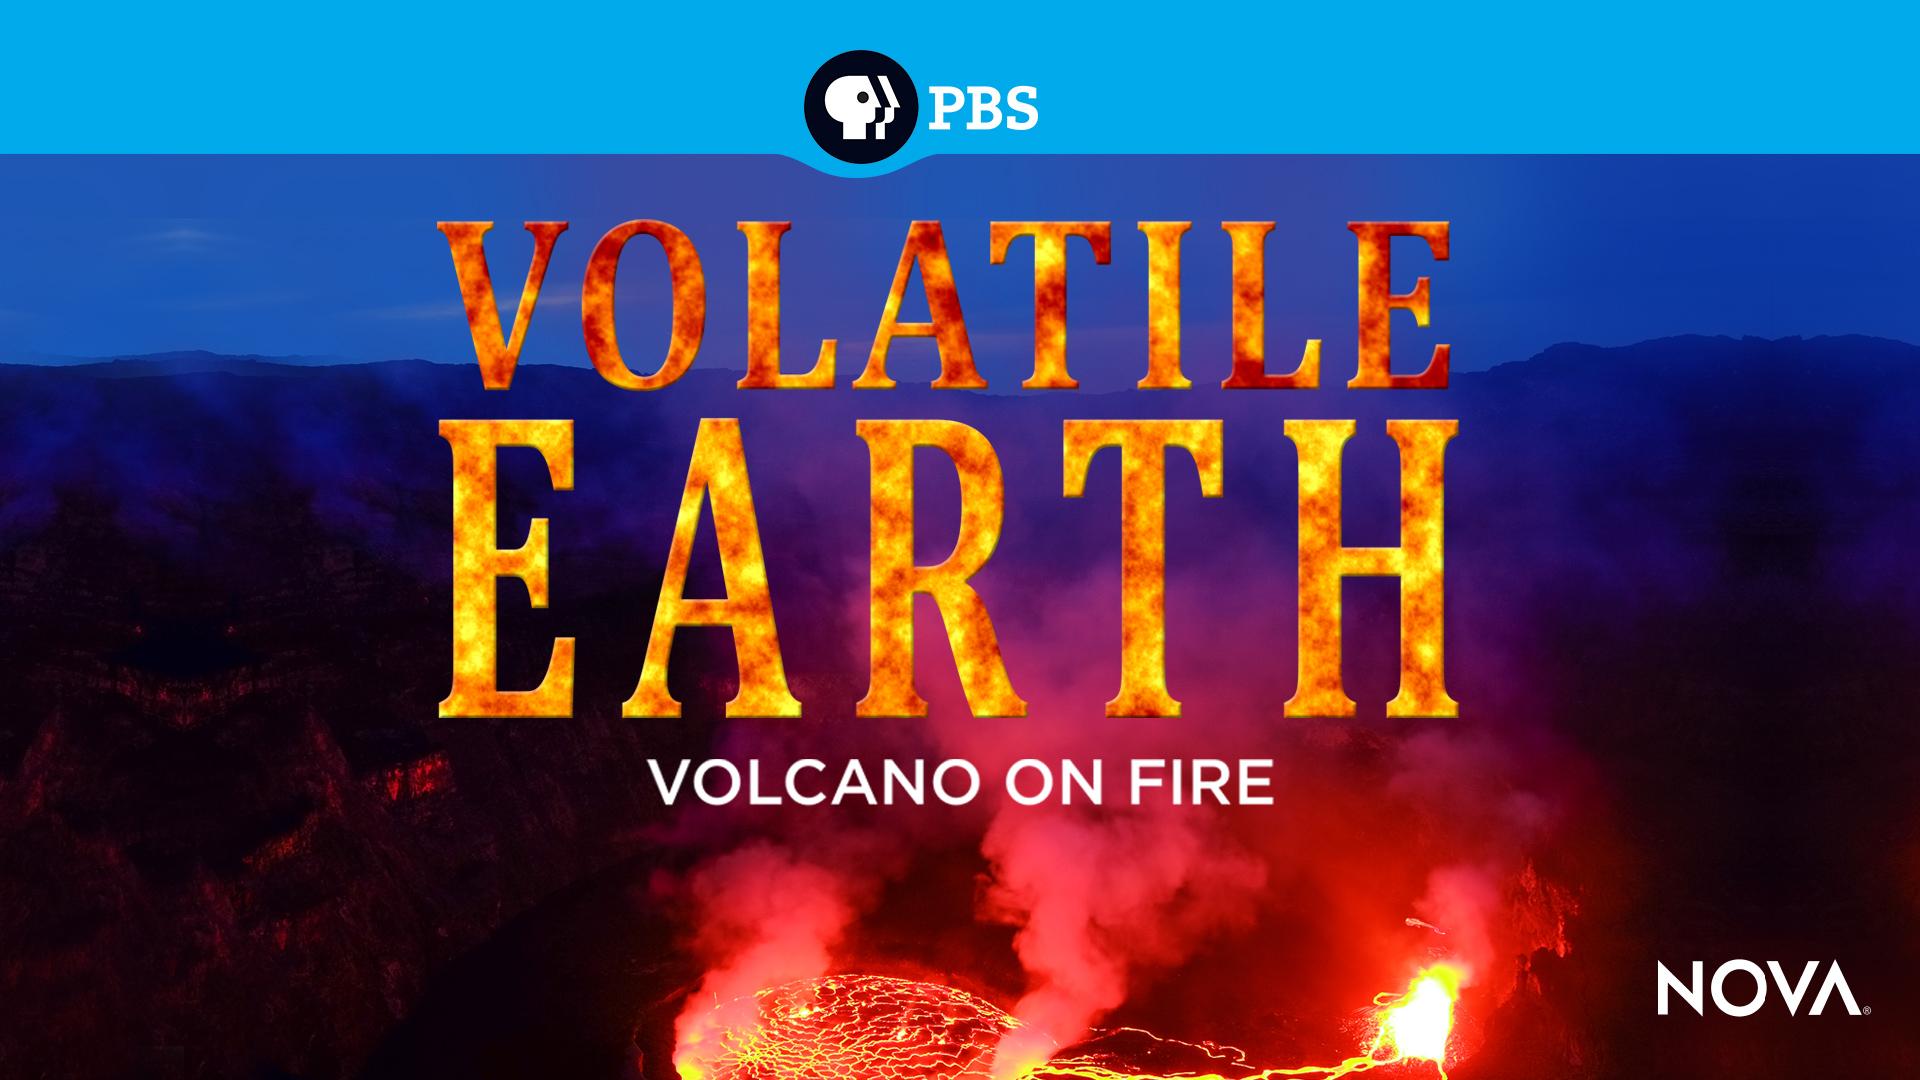 NOVA: Volatile Earth - Volcano on Fire